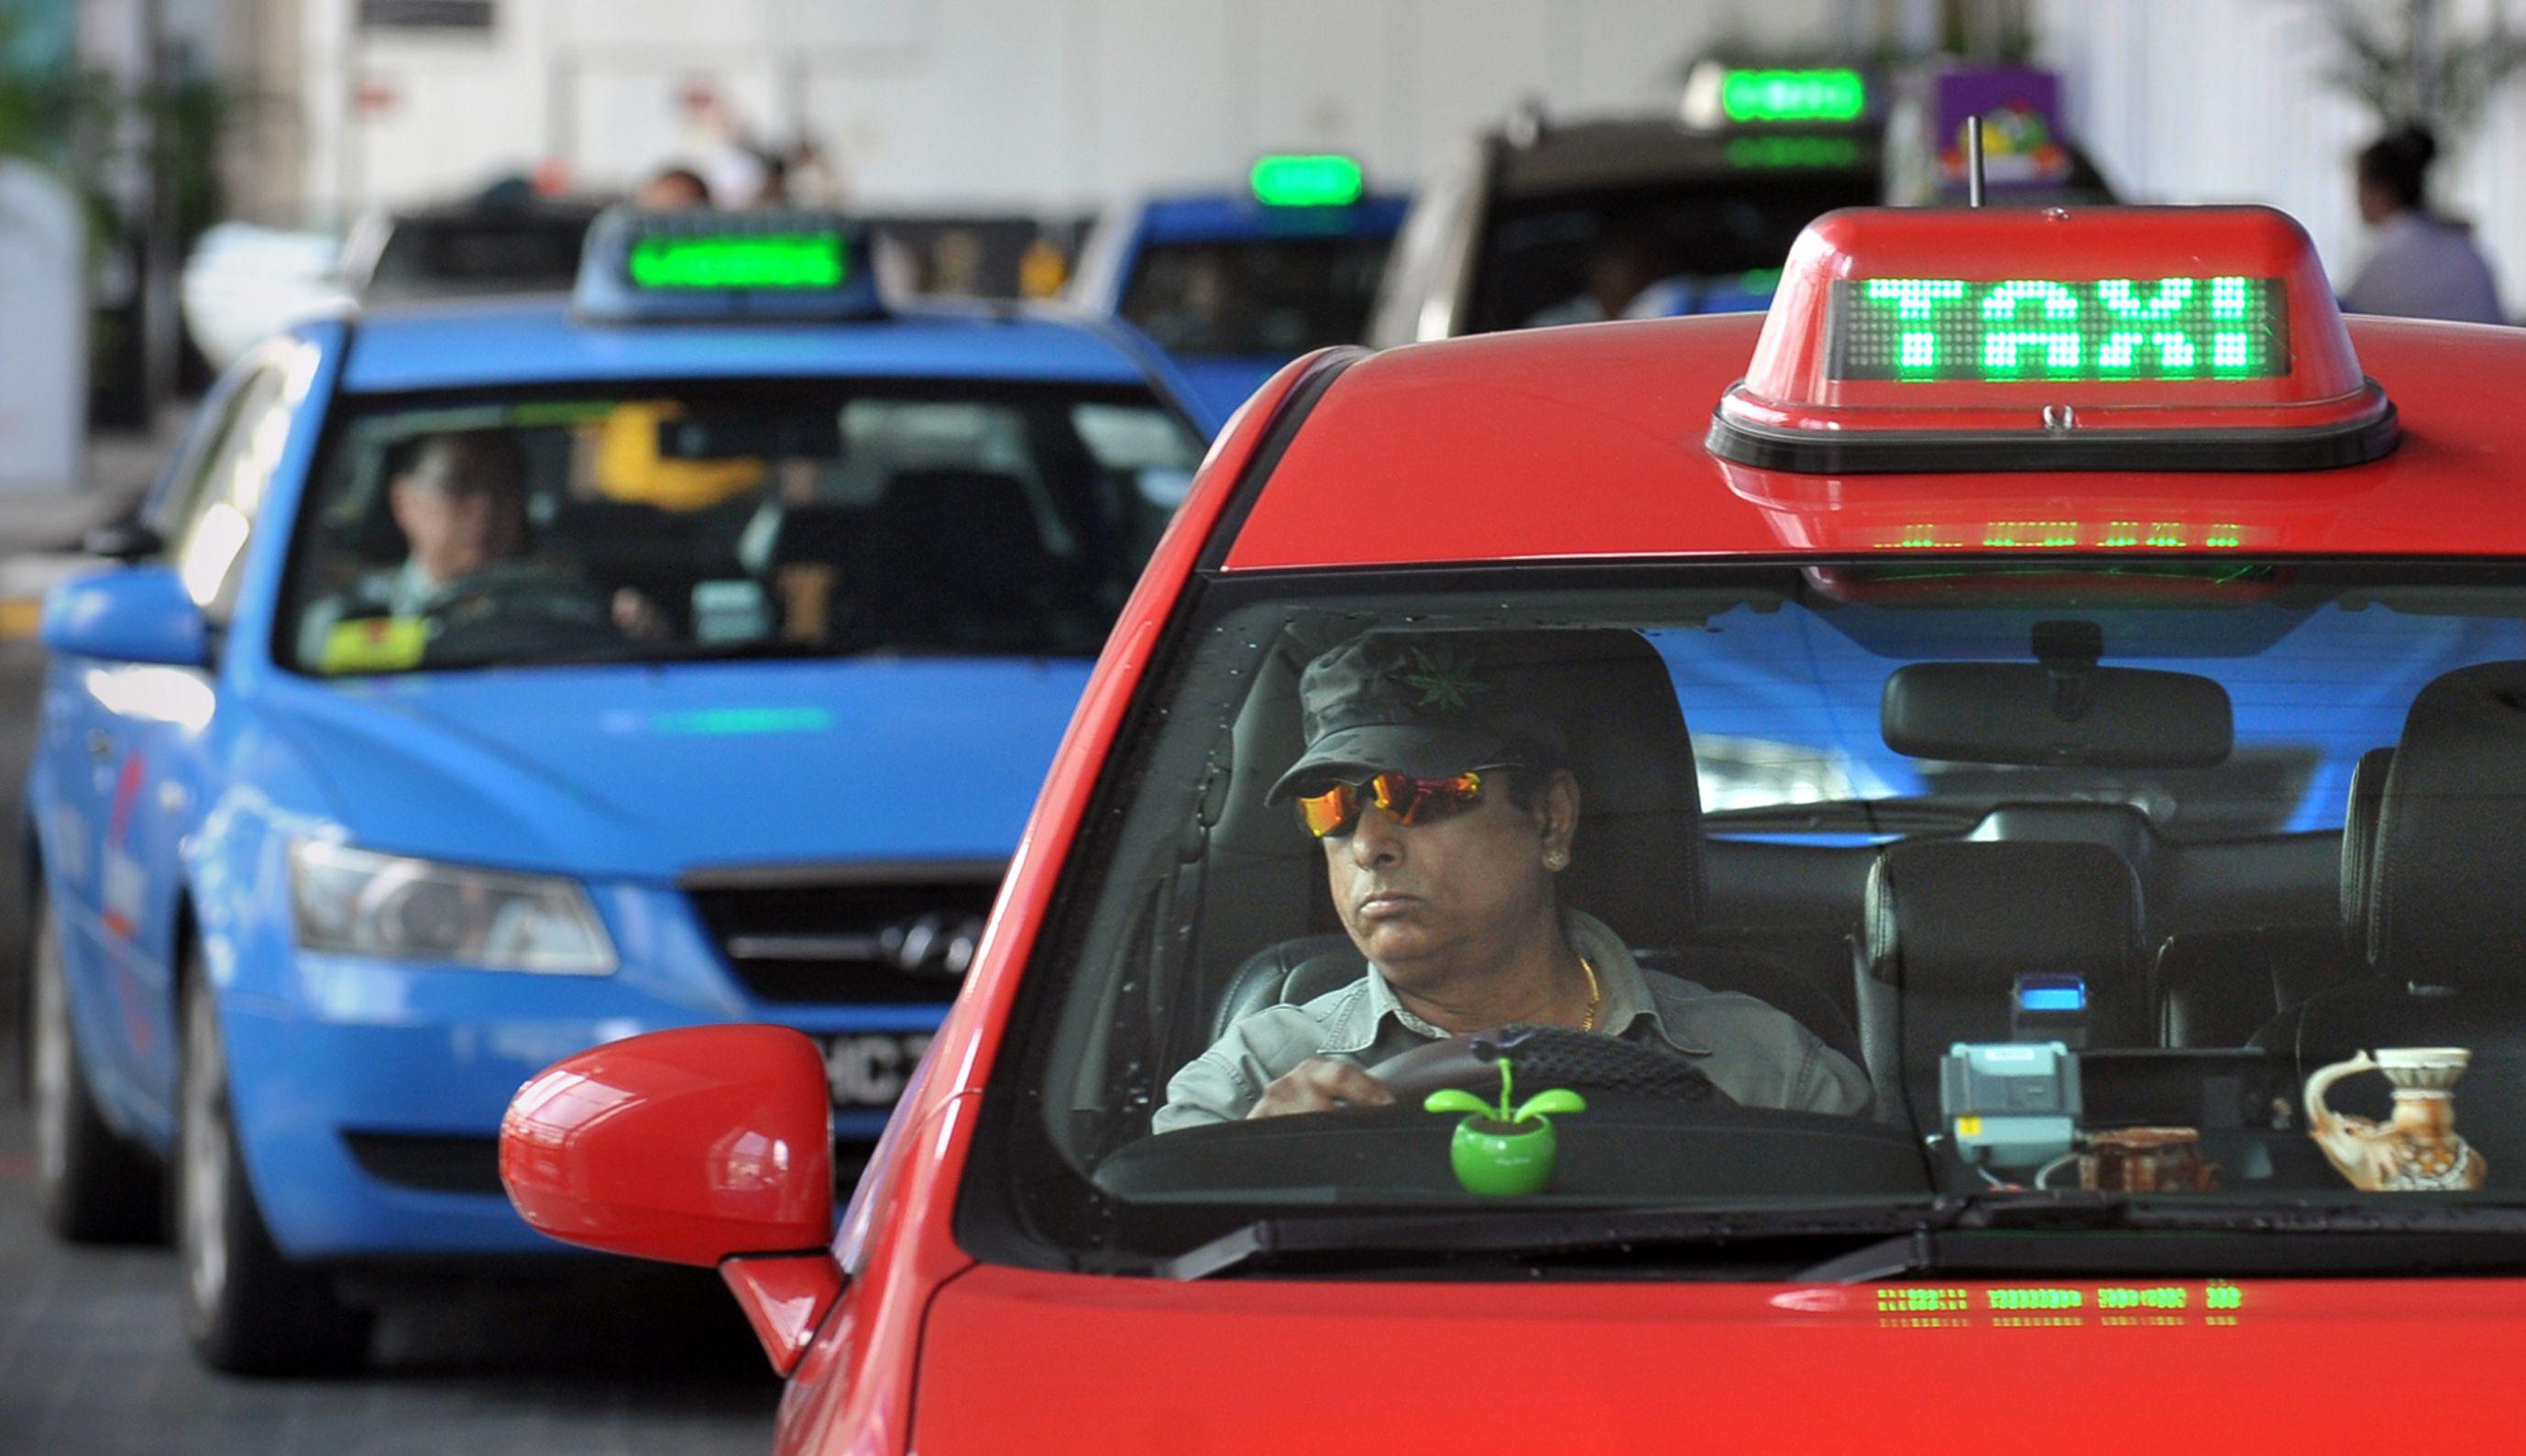 Singapore taxis in queue